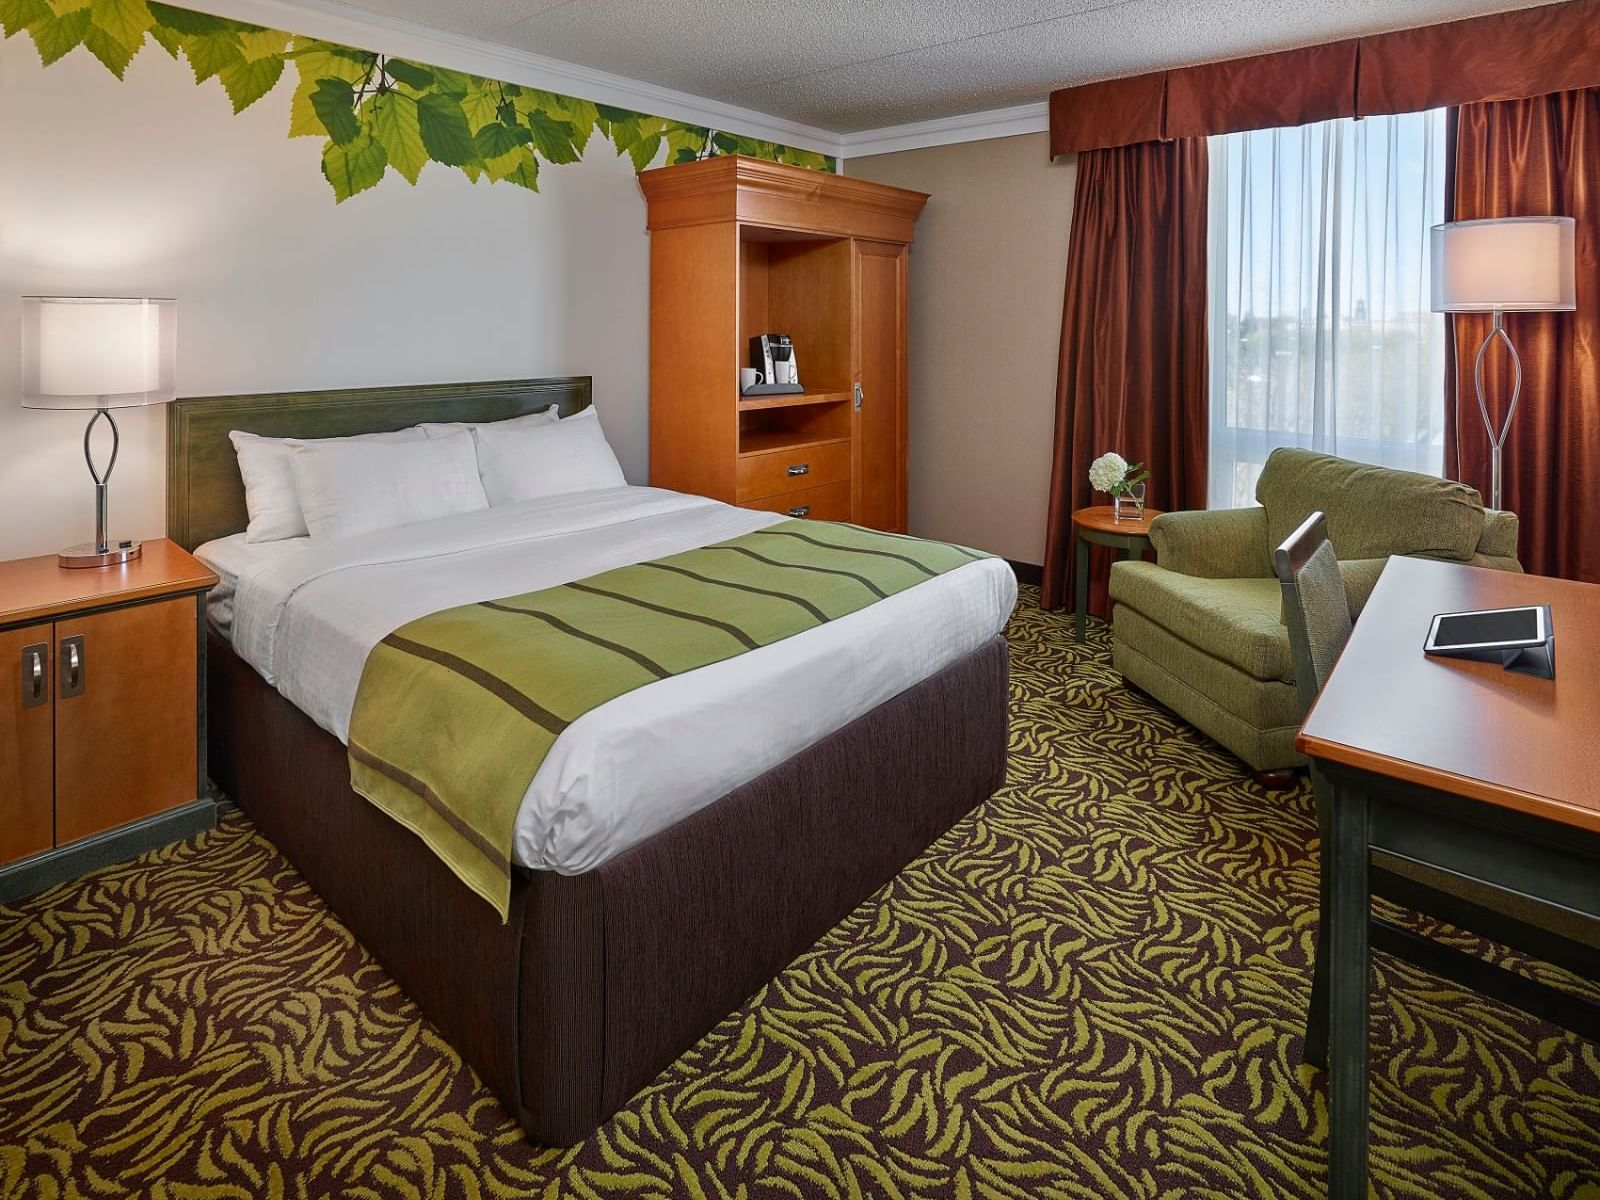 Deluxe Queen Bedroom with queen bed at Varscona Hotel on Whyte